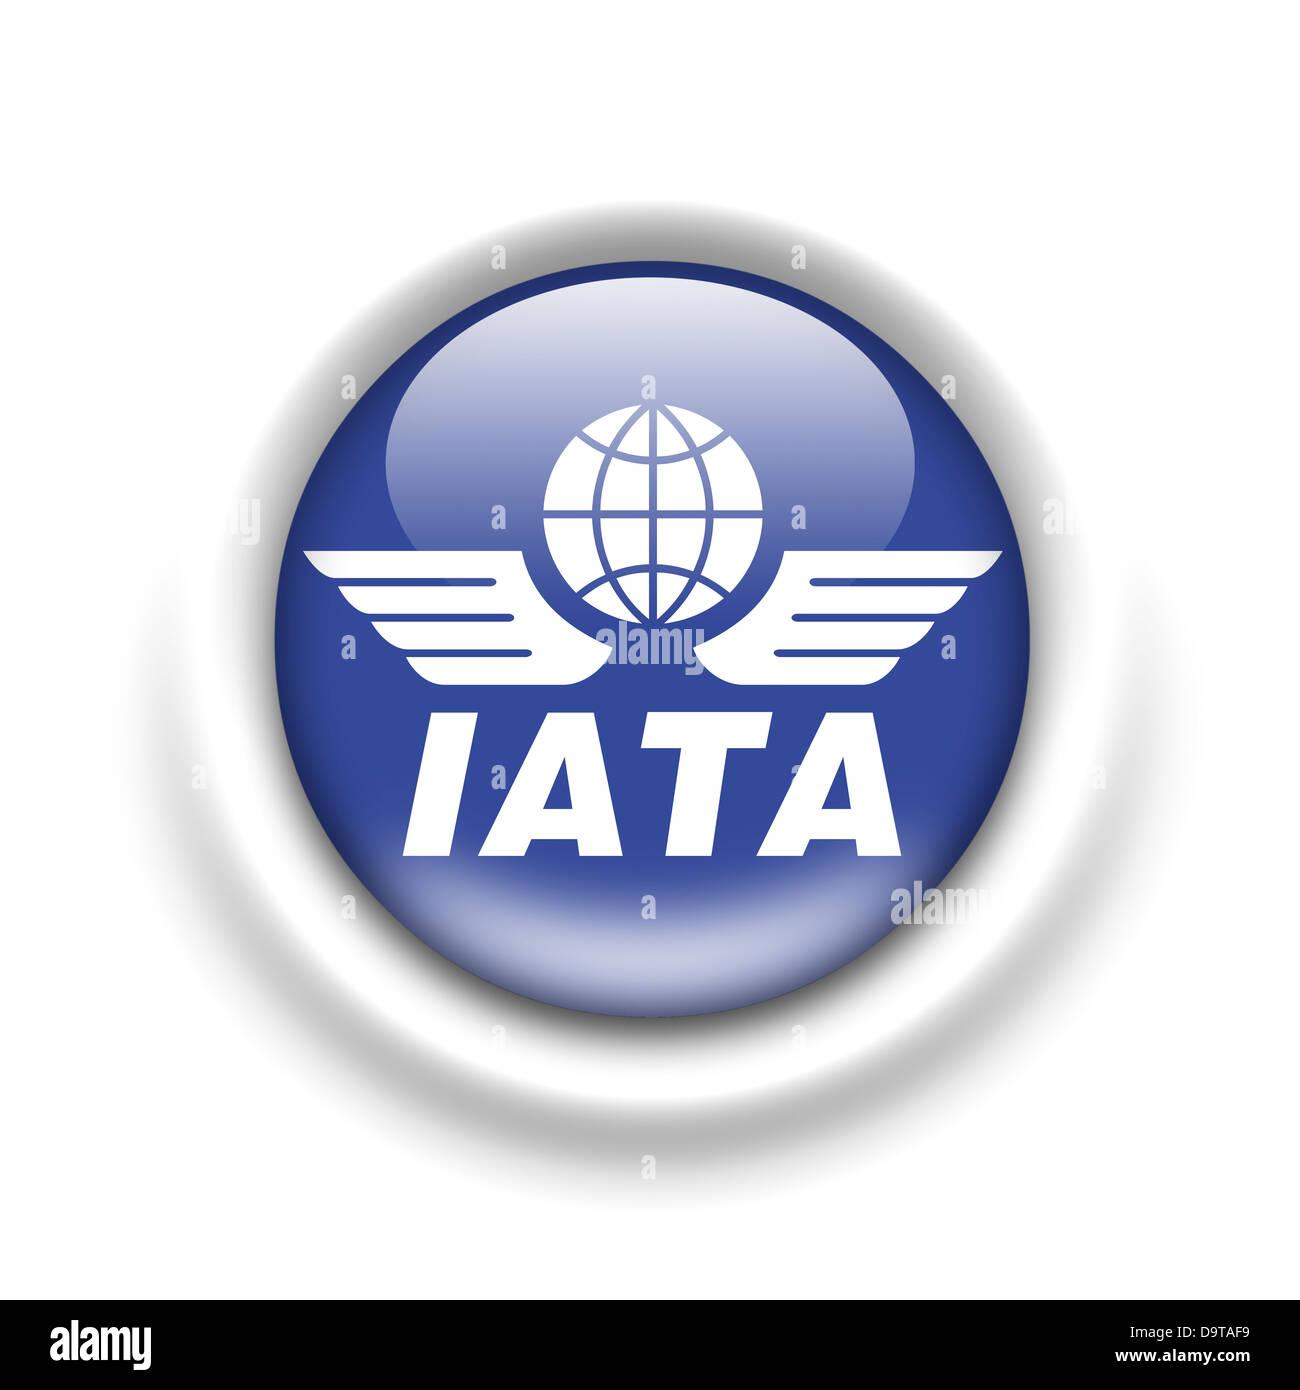 iata logo high resolution stock photography and images alamy https www alamy com stock photo iata international air transport association logo flag symbol icon 57698125 html